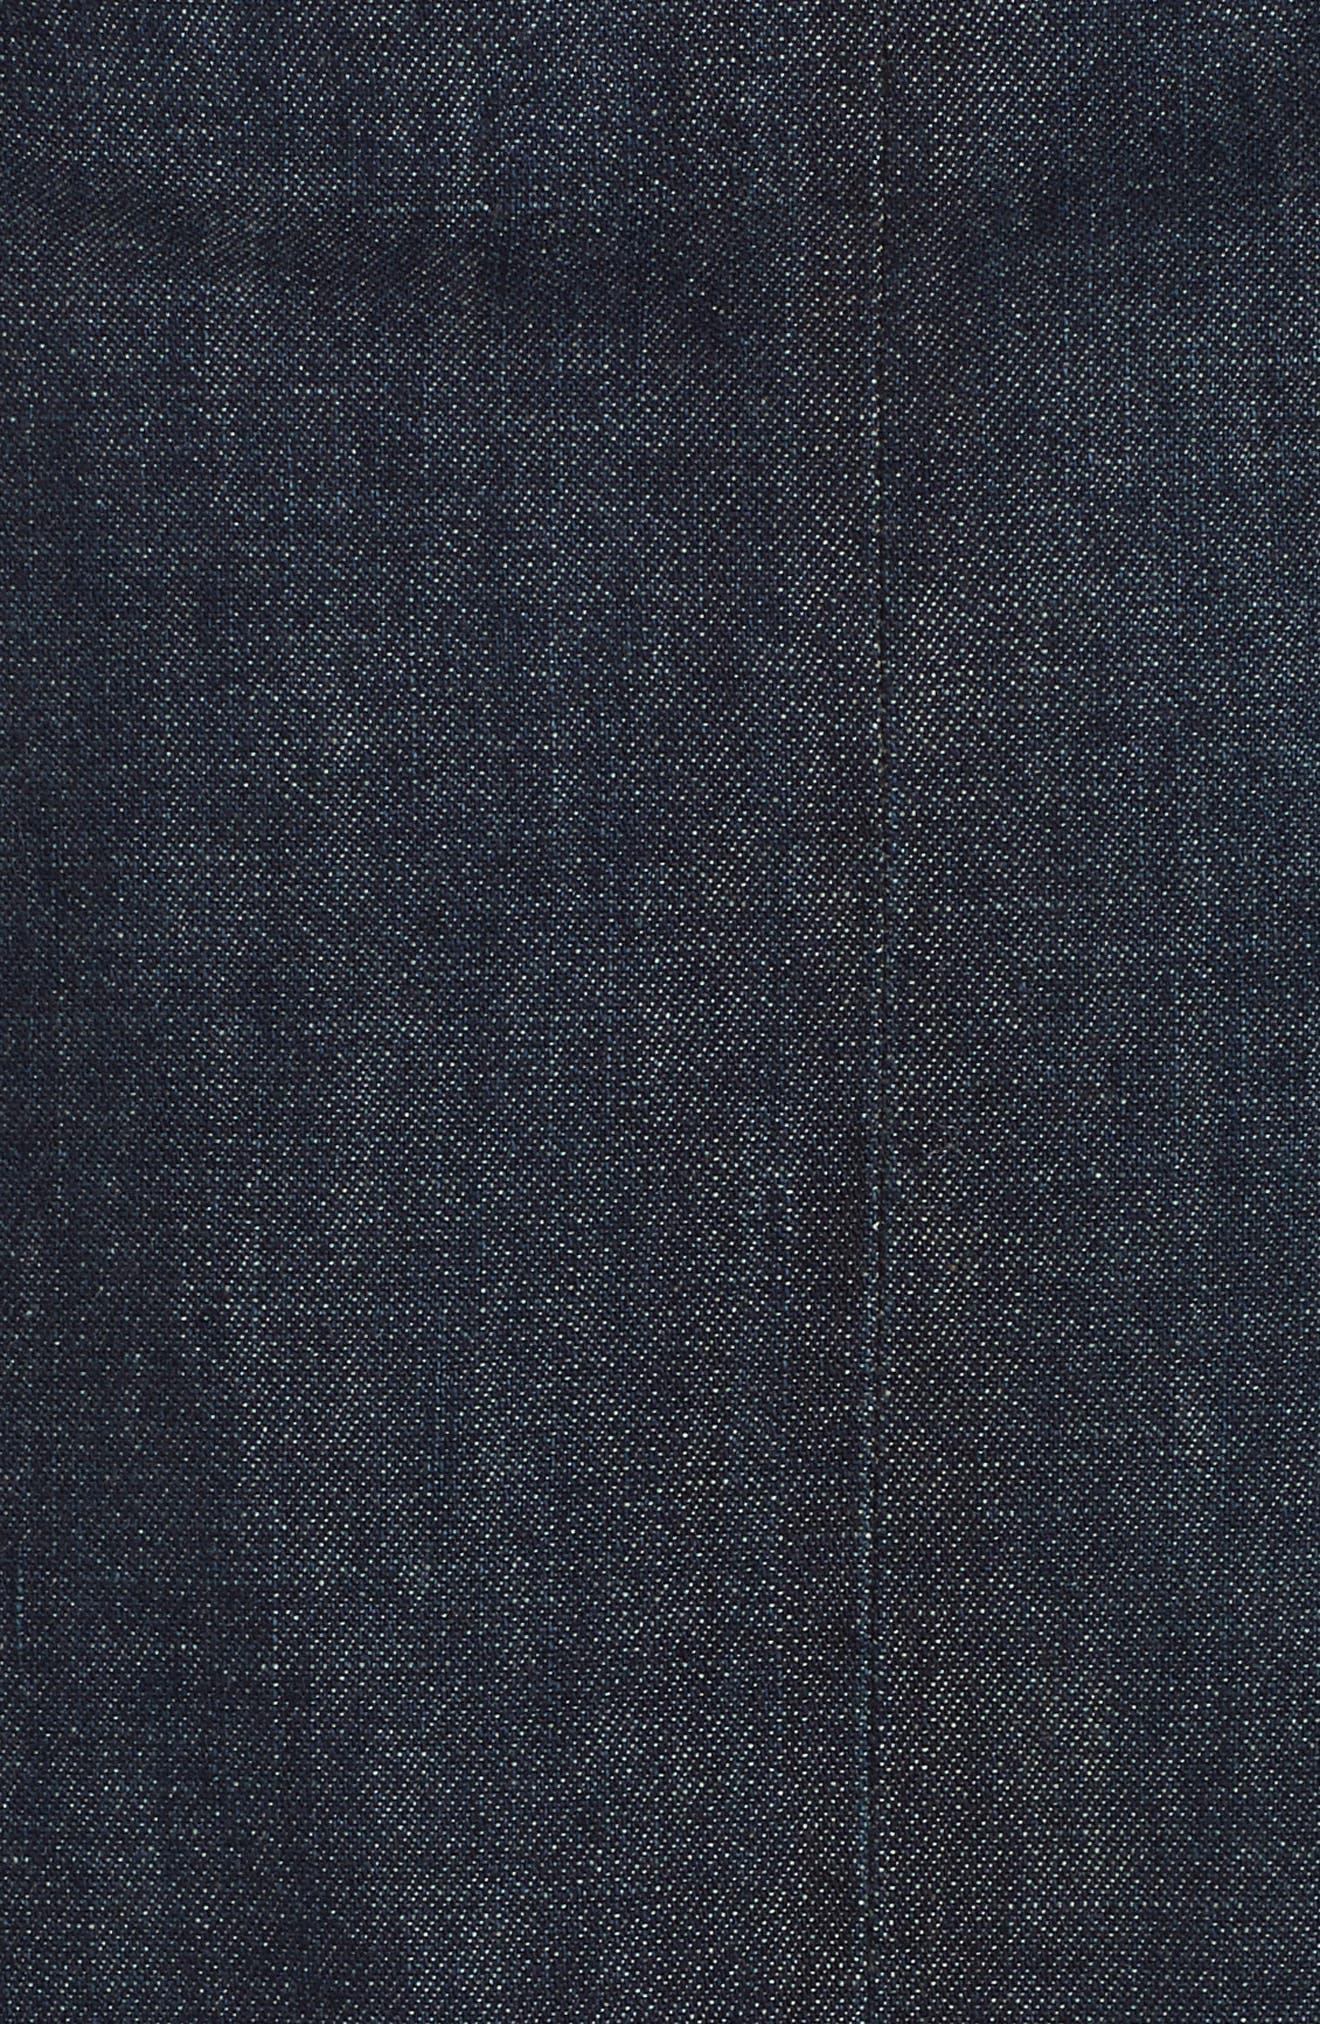 Denim Midi Skirt,                             Alternate thumbnail 5, color,                             DARK INDIGO